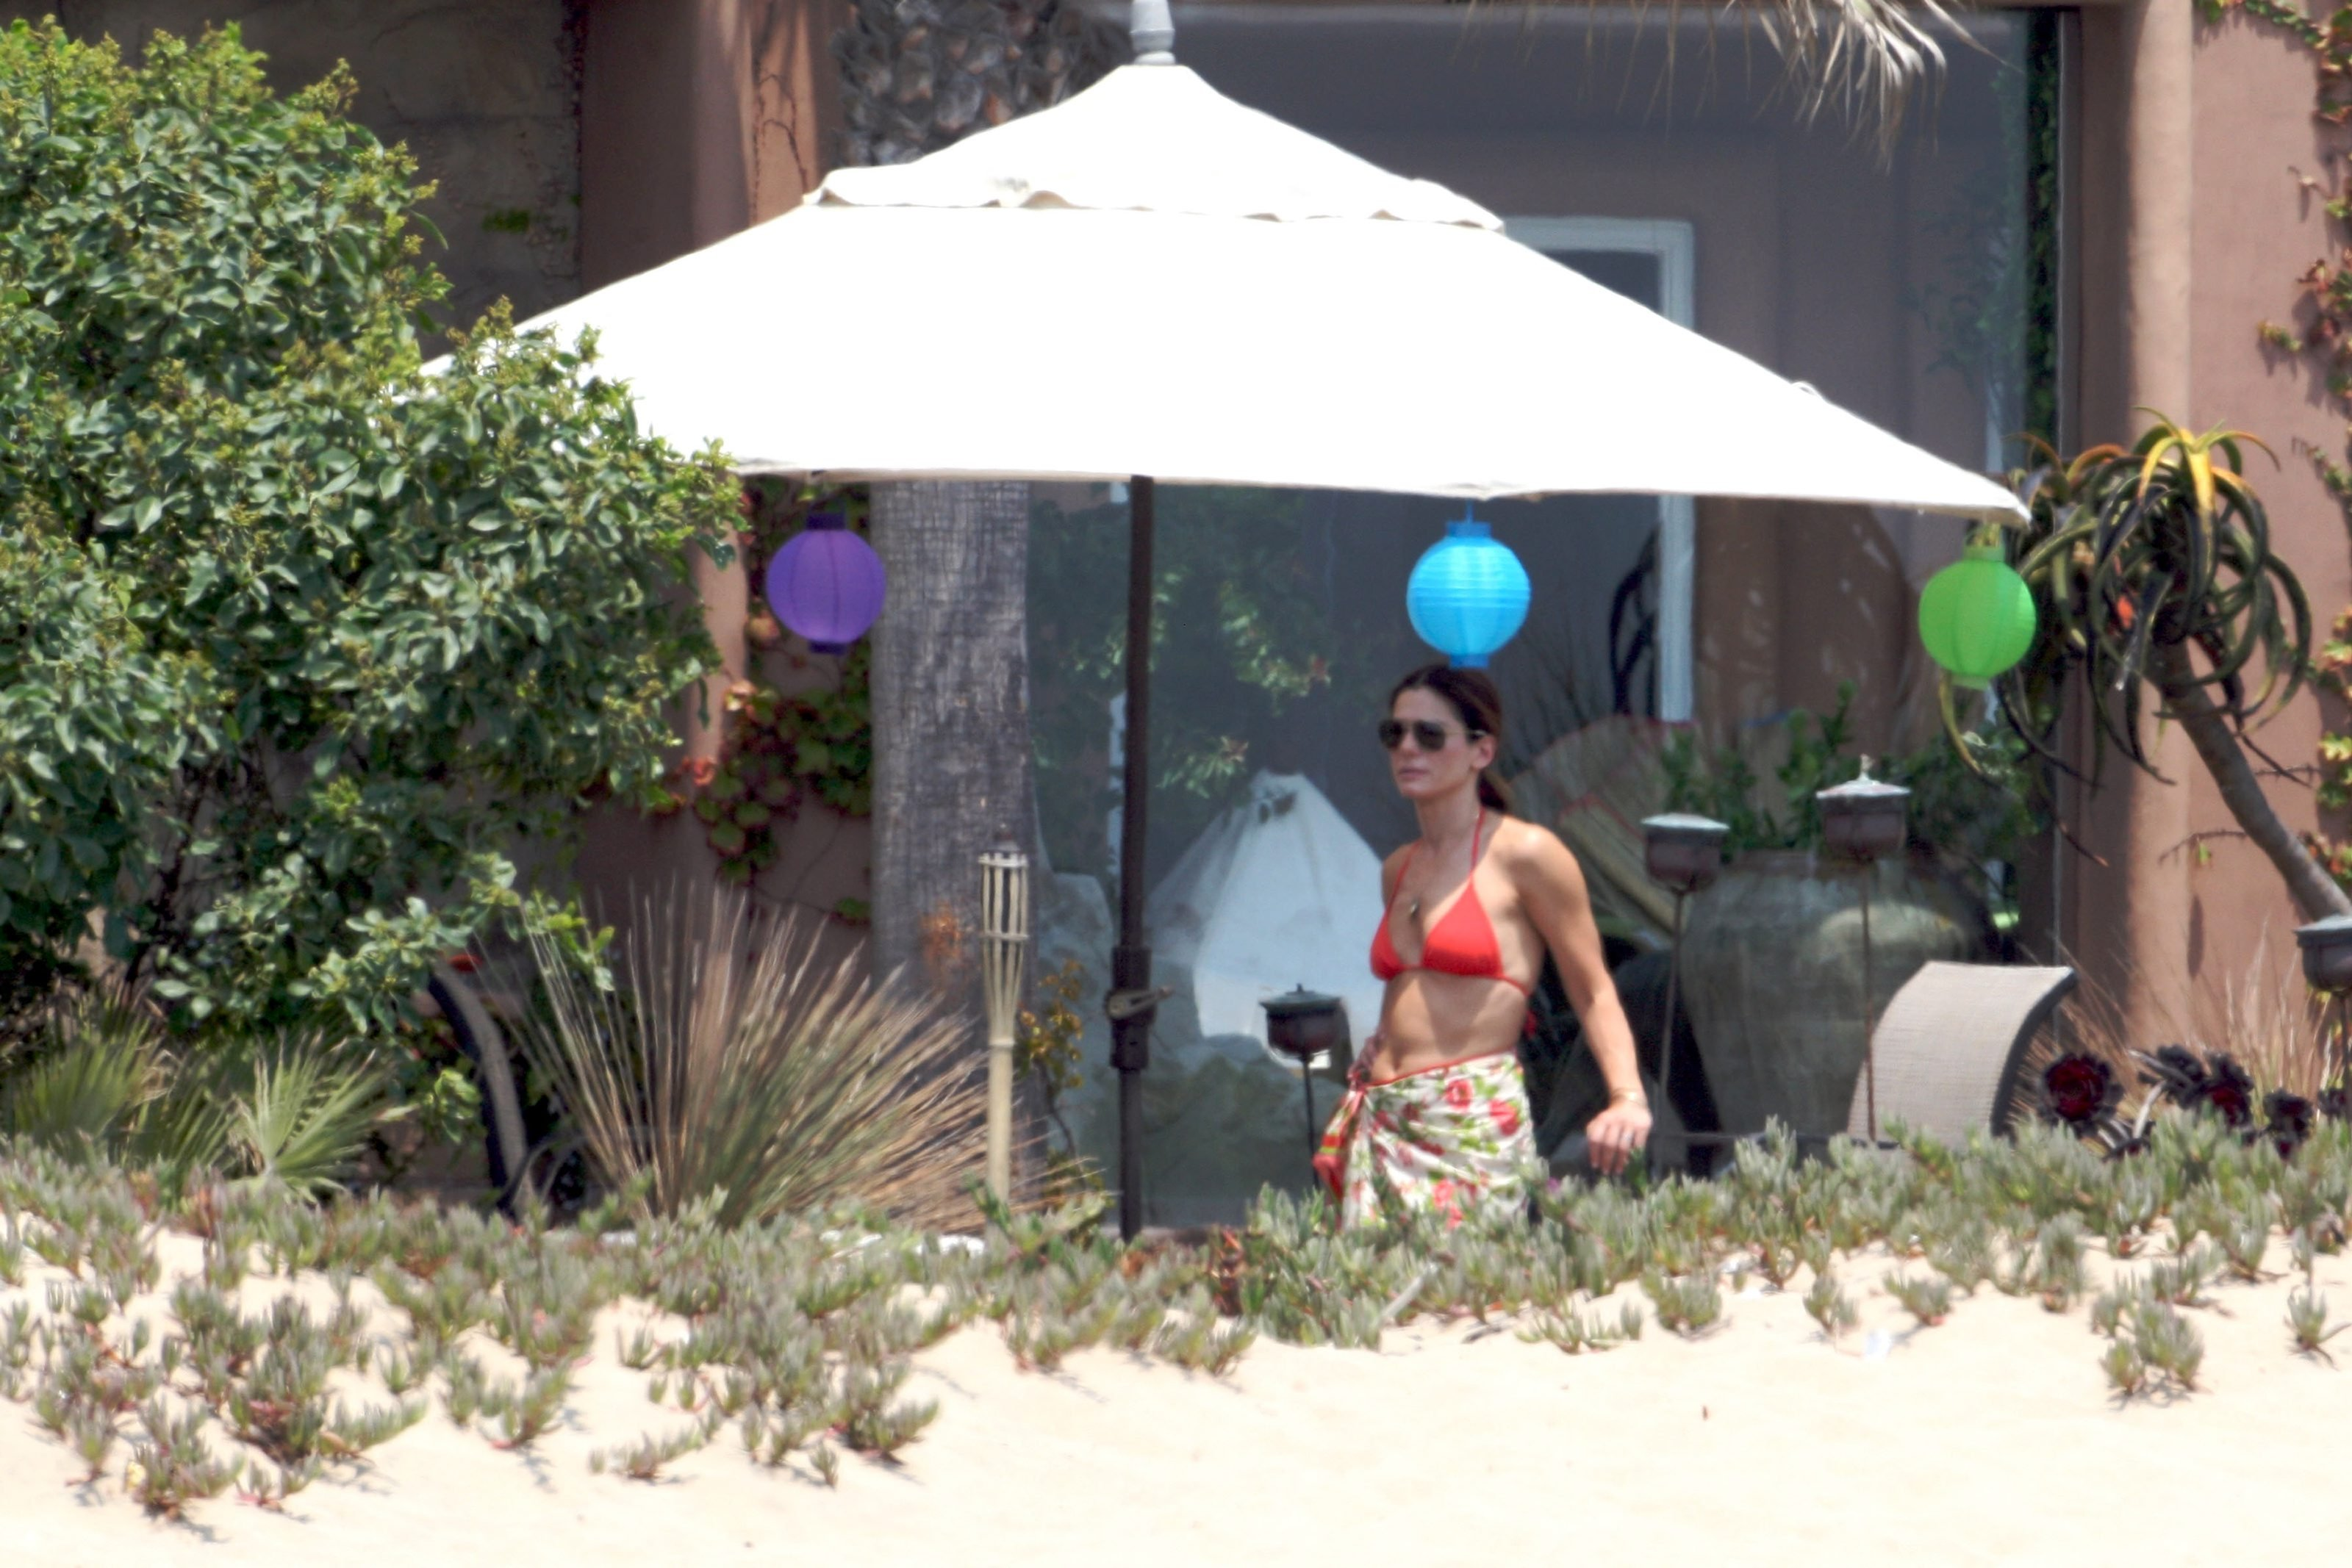 79157_Celebutopia-Sandra_Bullock_in_top_bikini_and_husband_host_an_Independence_Day_beach_party-15_122_514lo.jpg